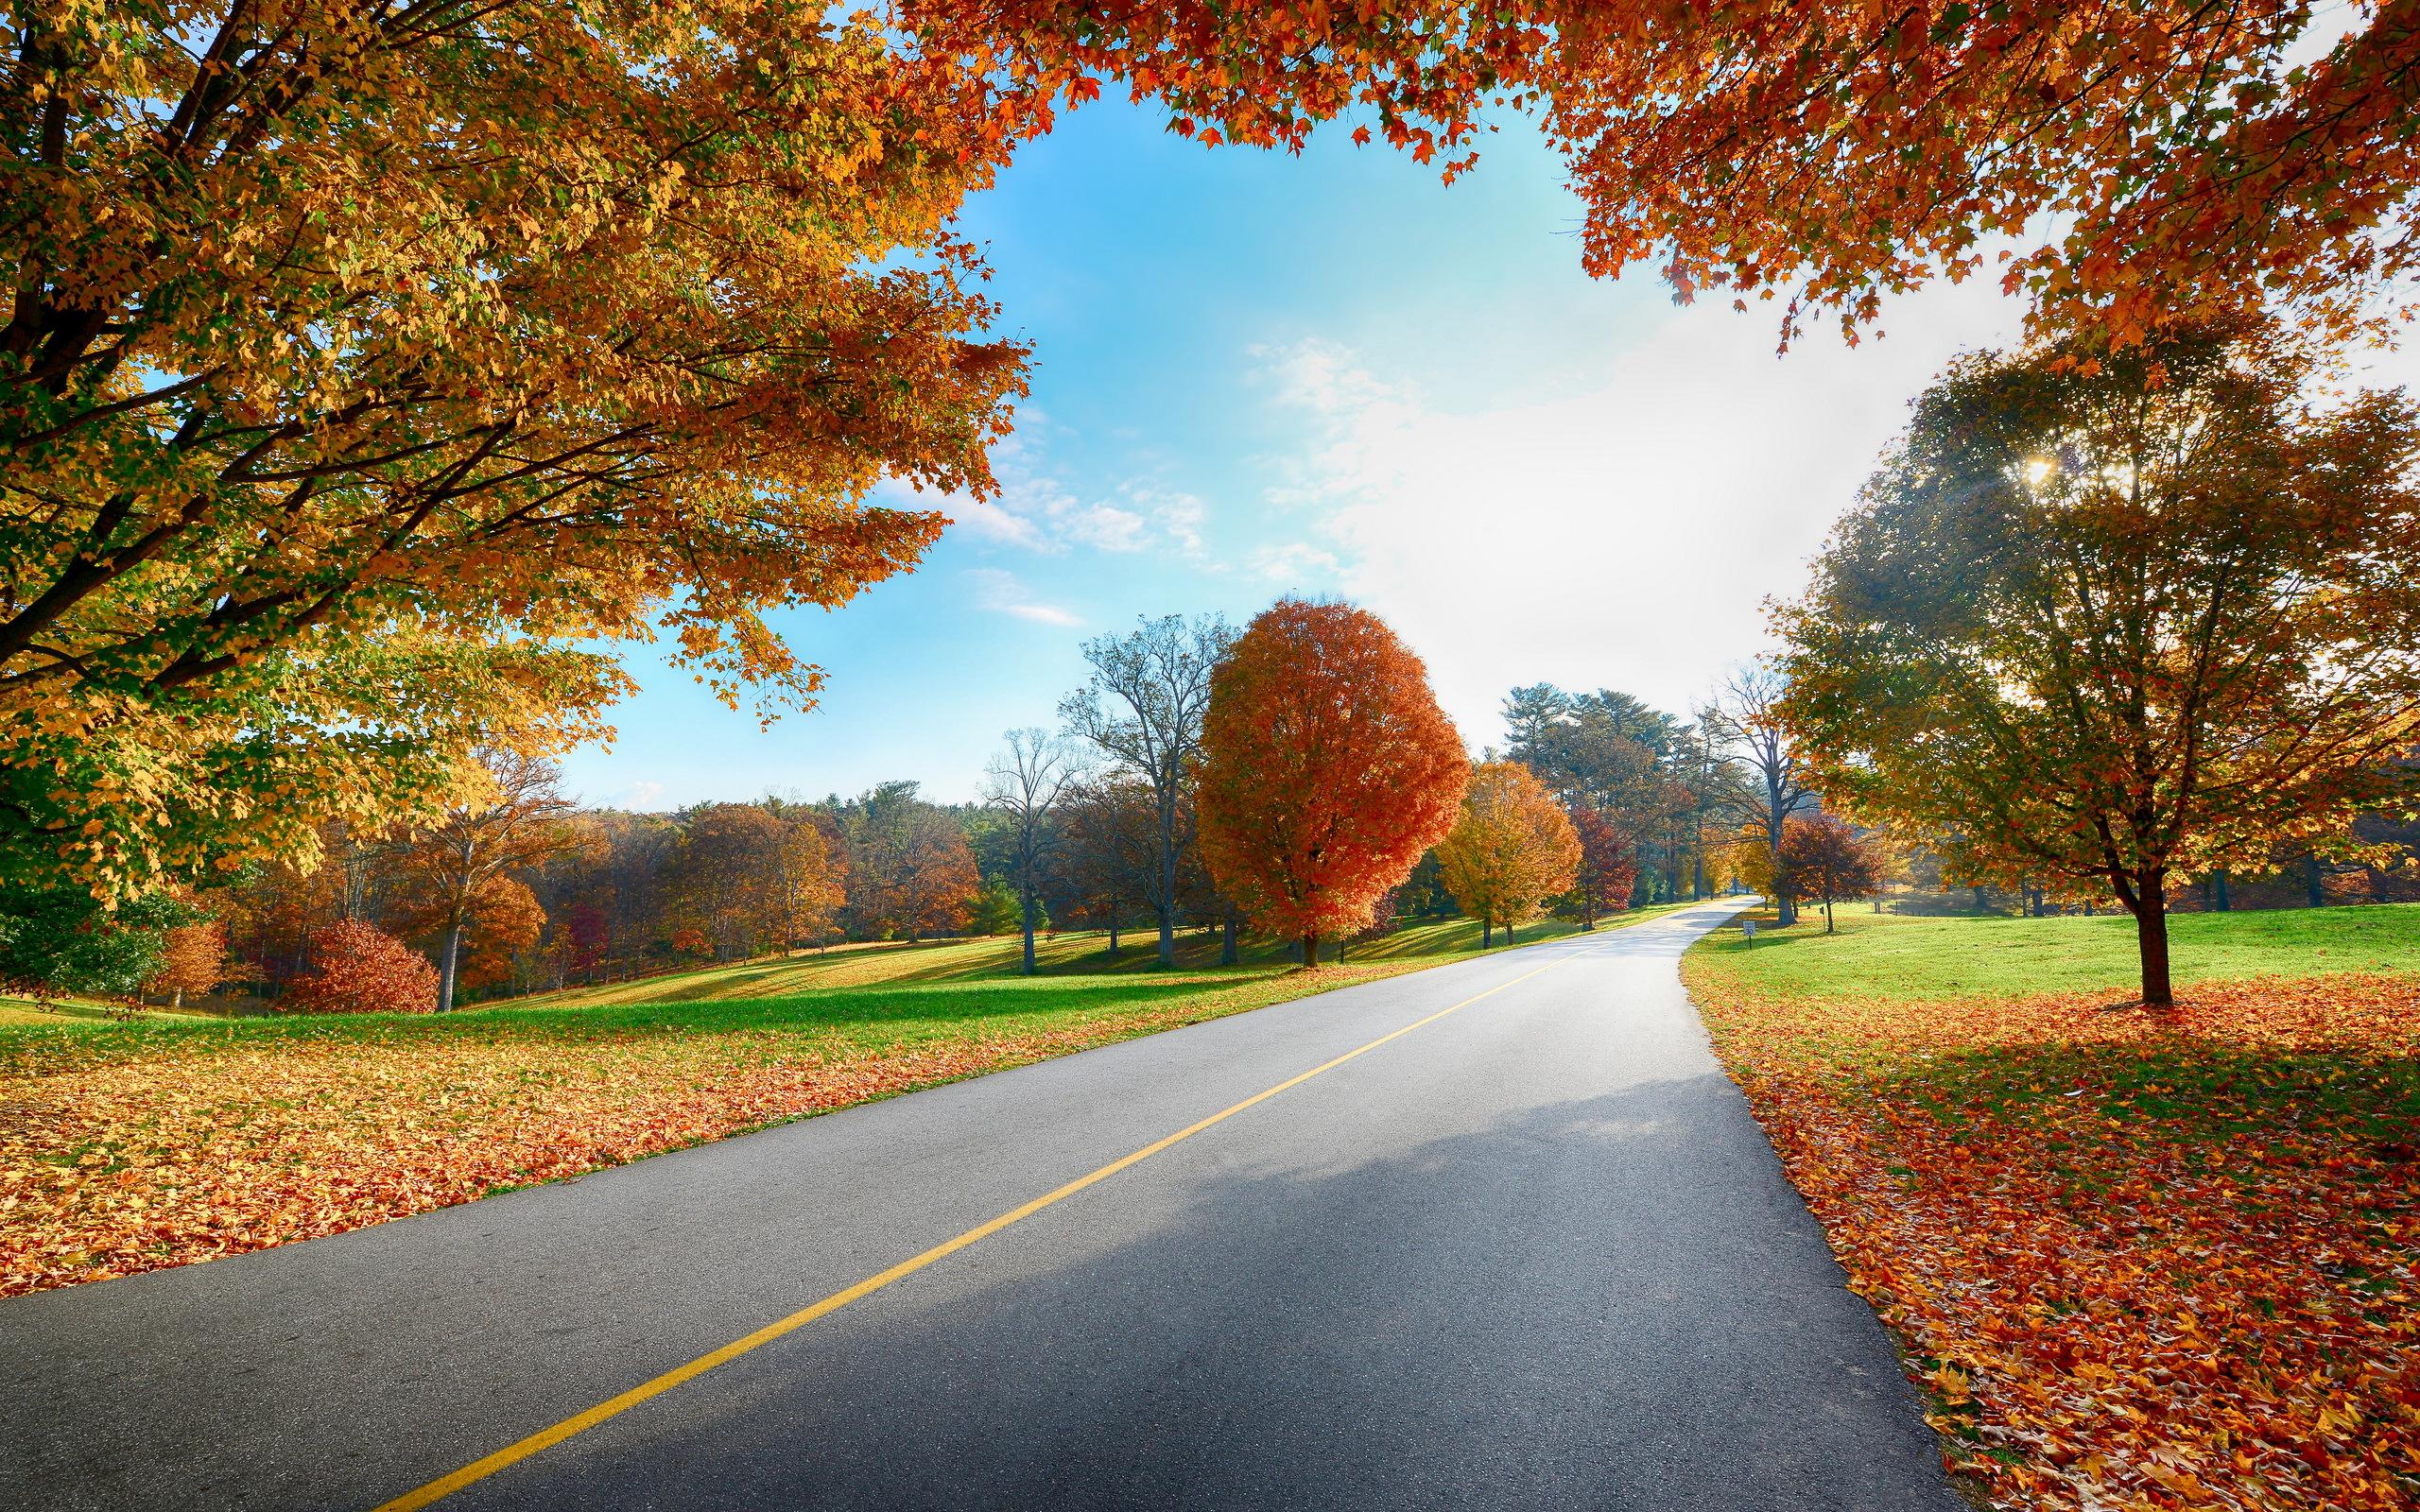 Autumn road nature scenery